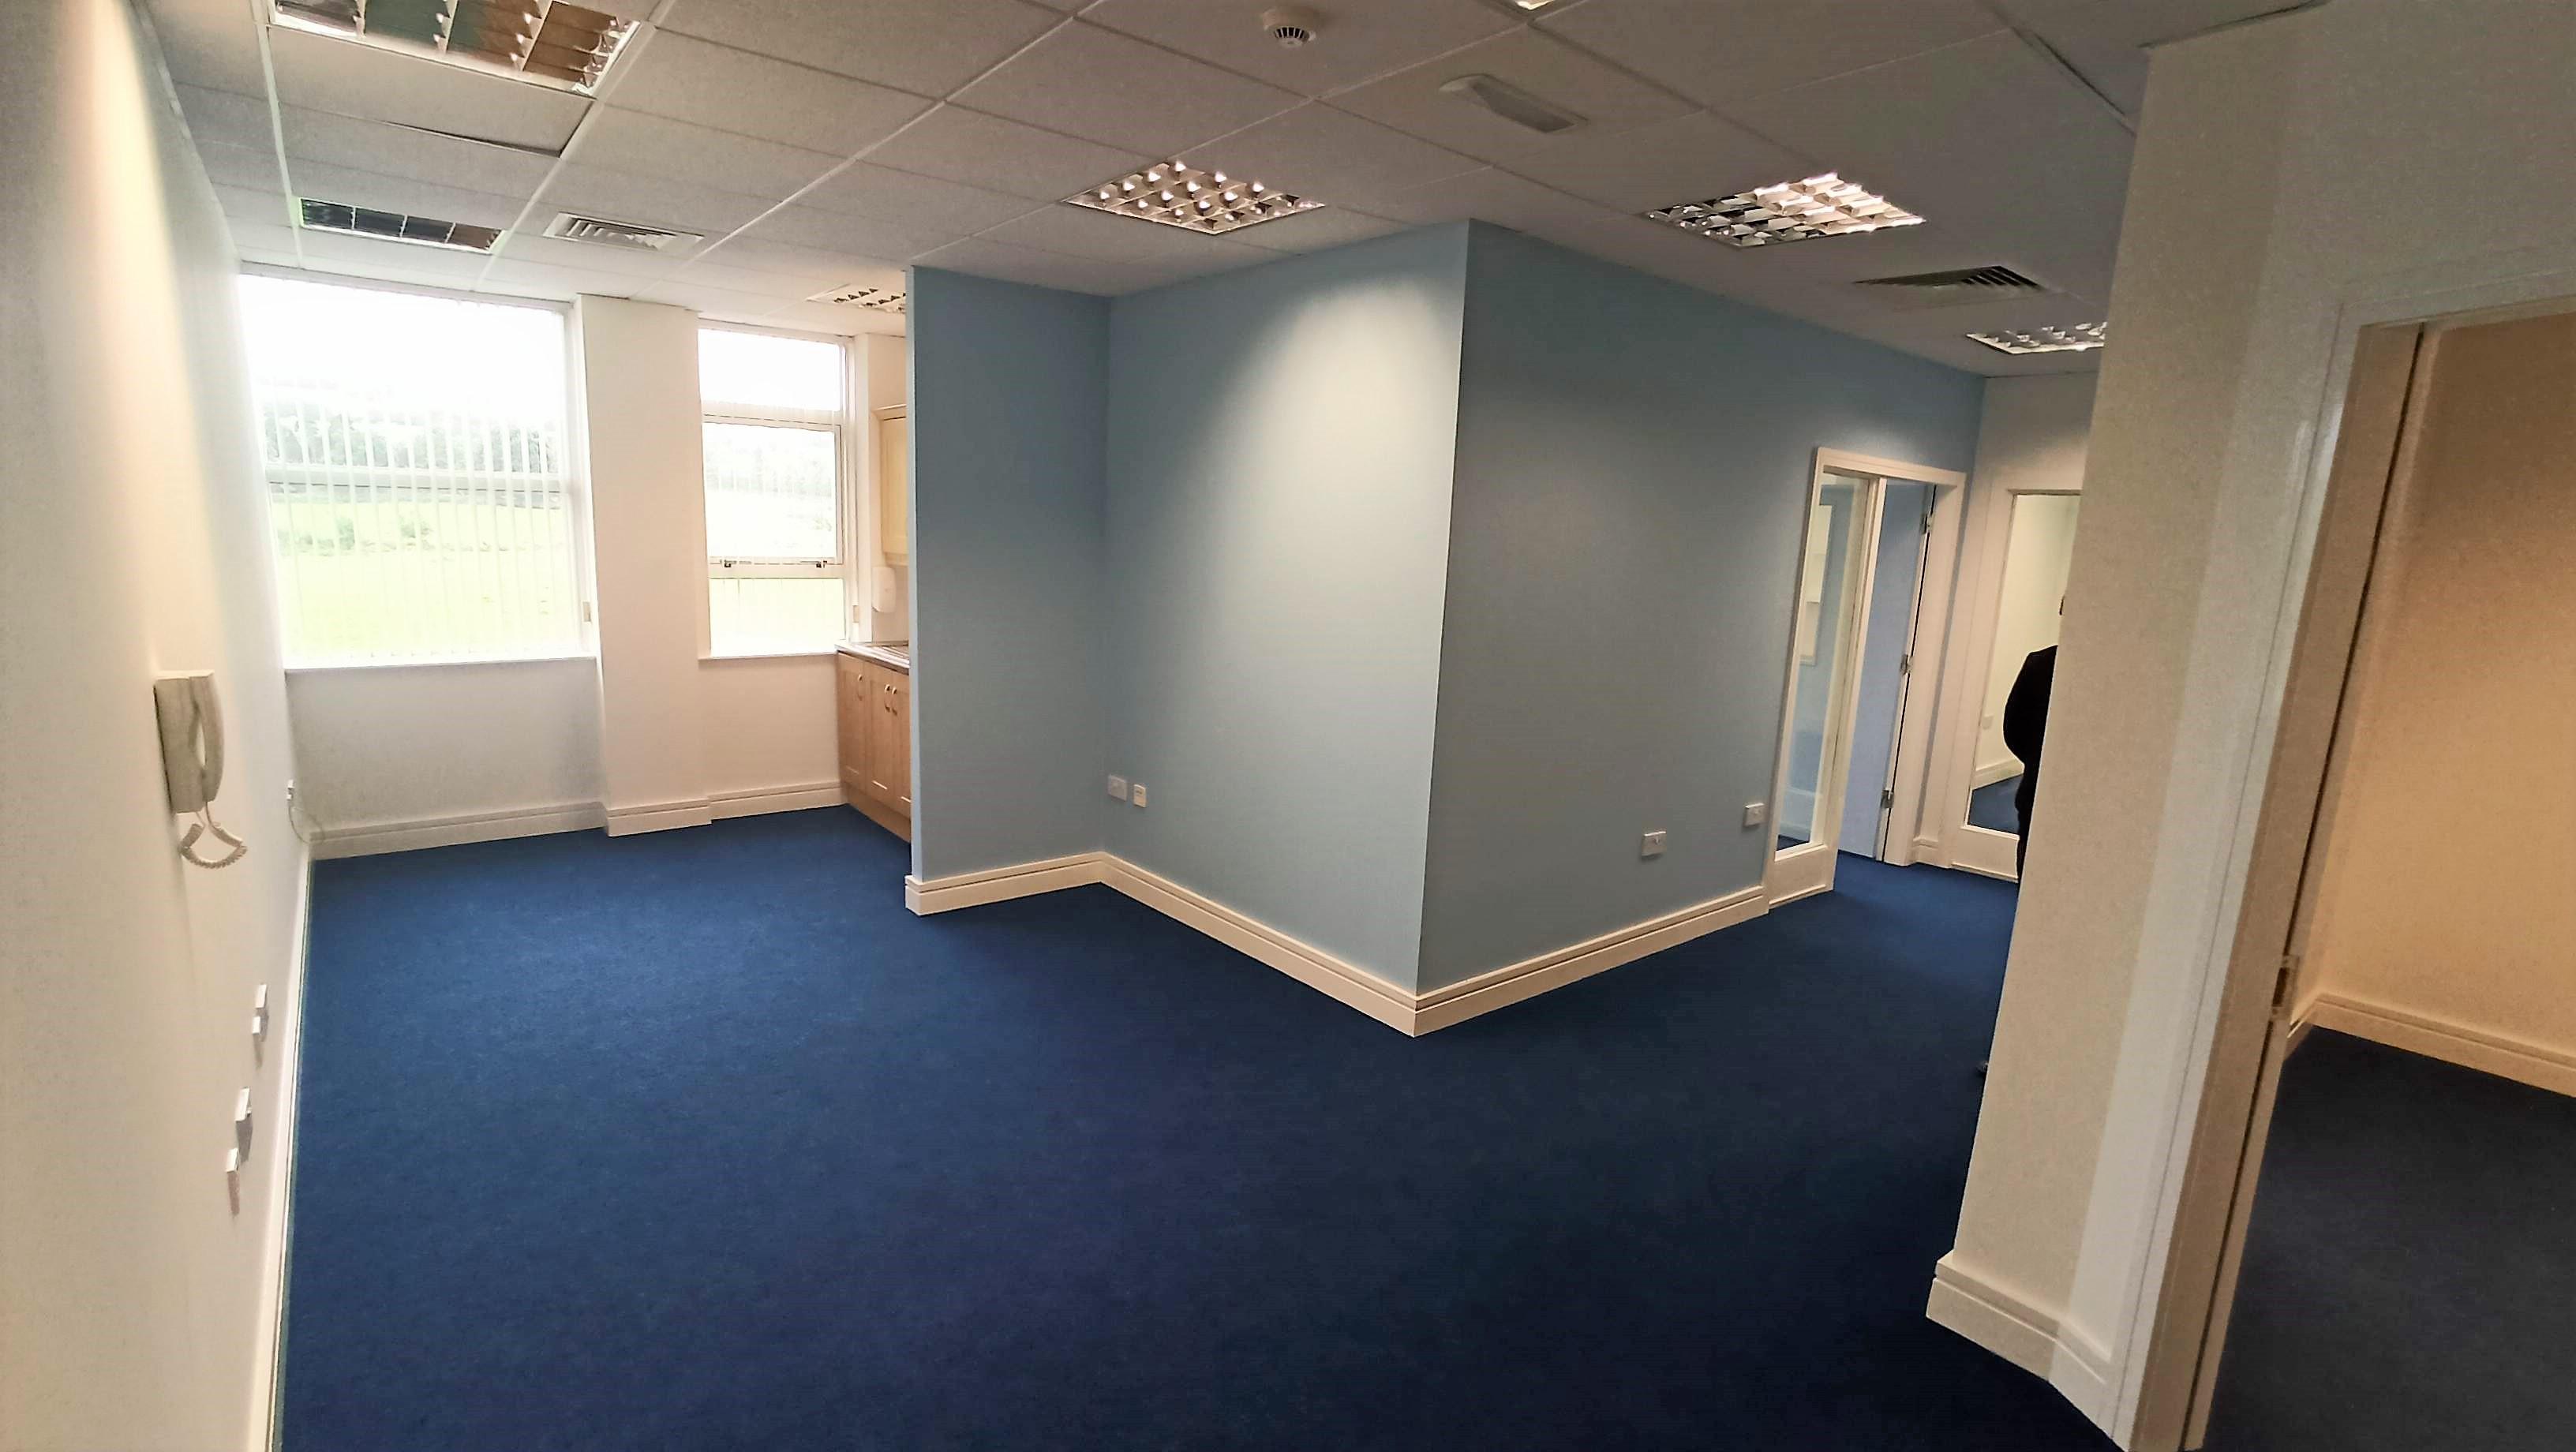 Unit 4B, Riverside Retail Office Park, Letterkenny, Co. Donegal, F92 XH2X